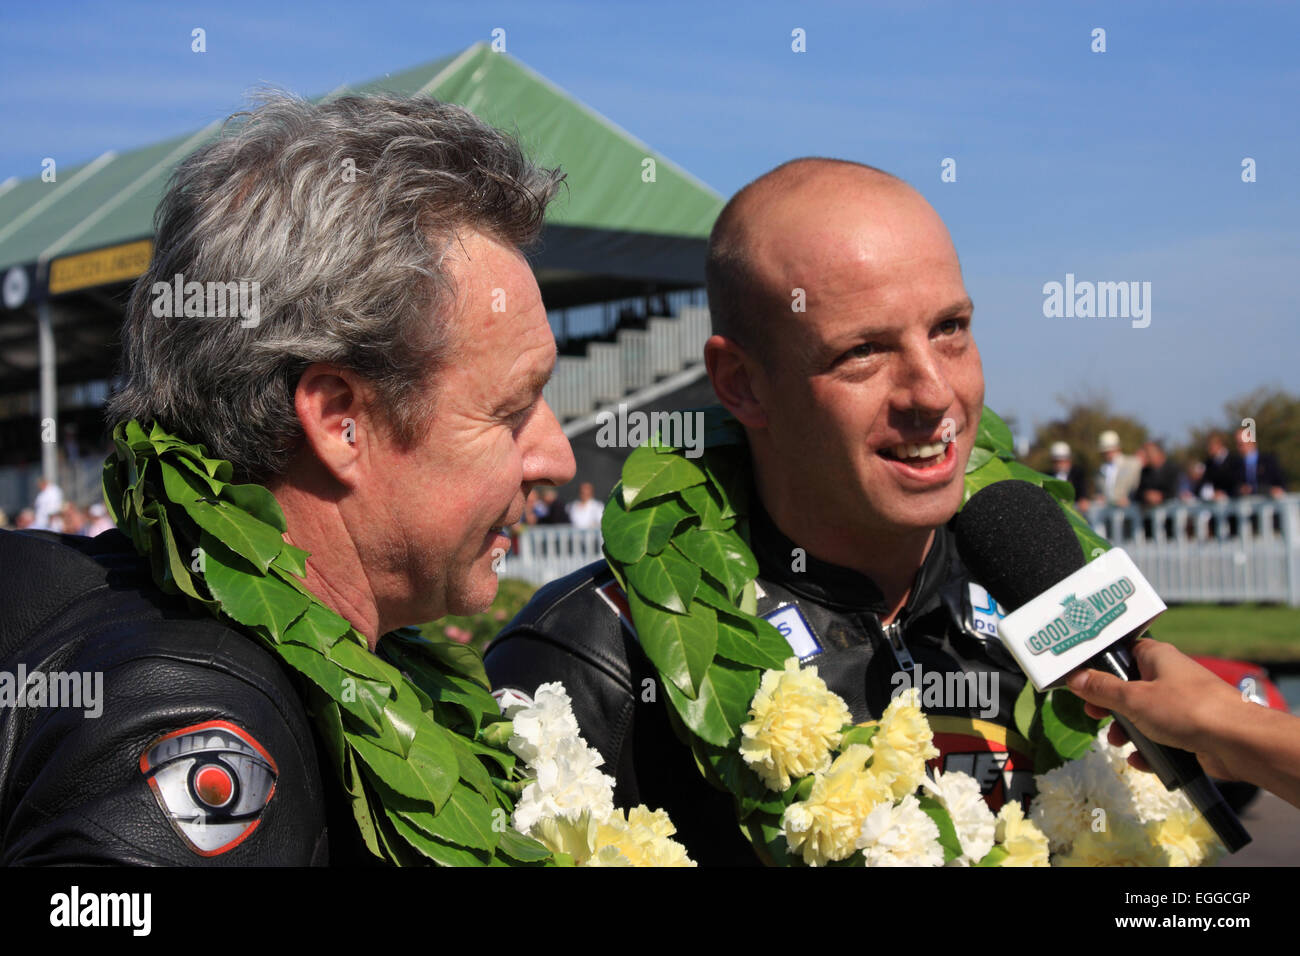 Former 500cc World Champion Wayne Gardner (left) & Mark Sharrock after winning the Barry Sheene Memorial / Goodwood - Stock Image